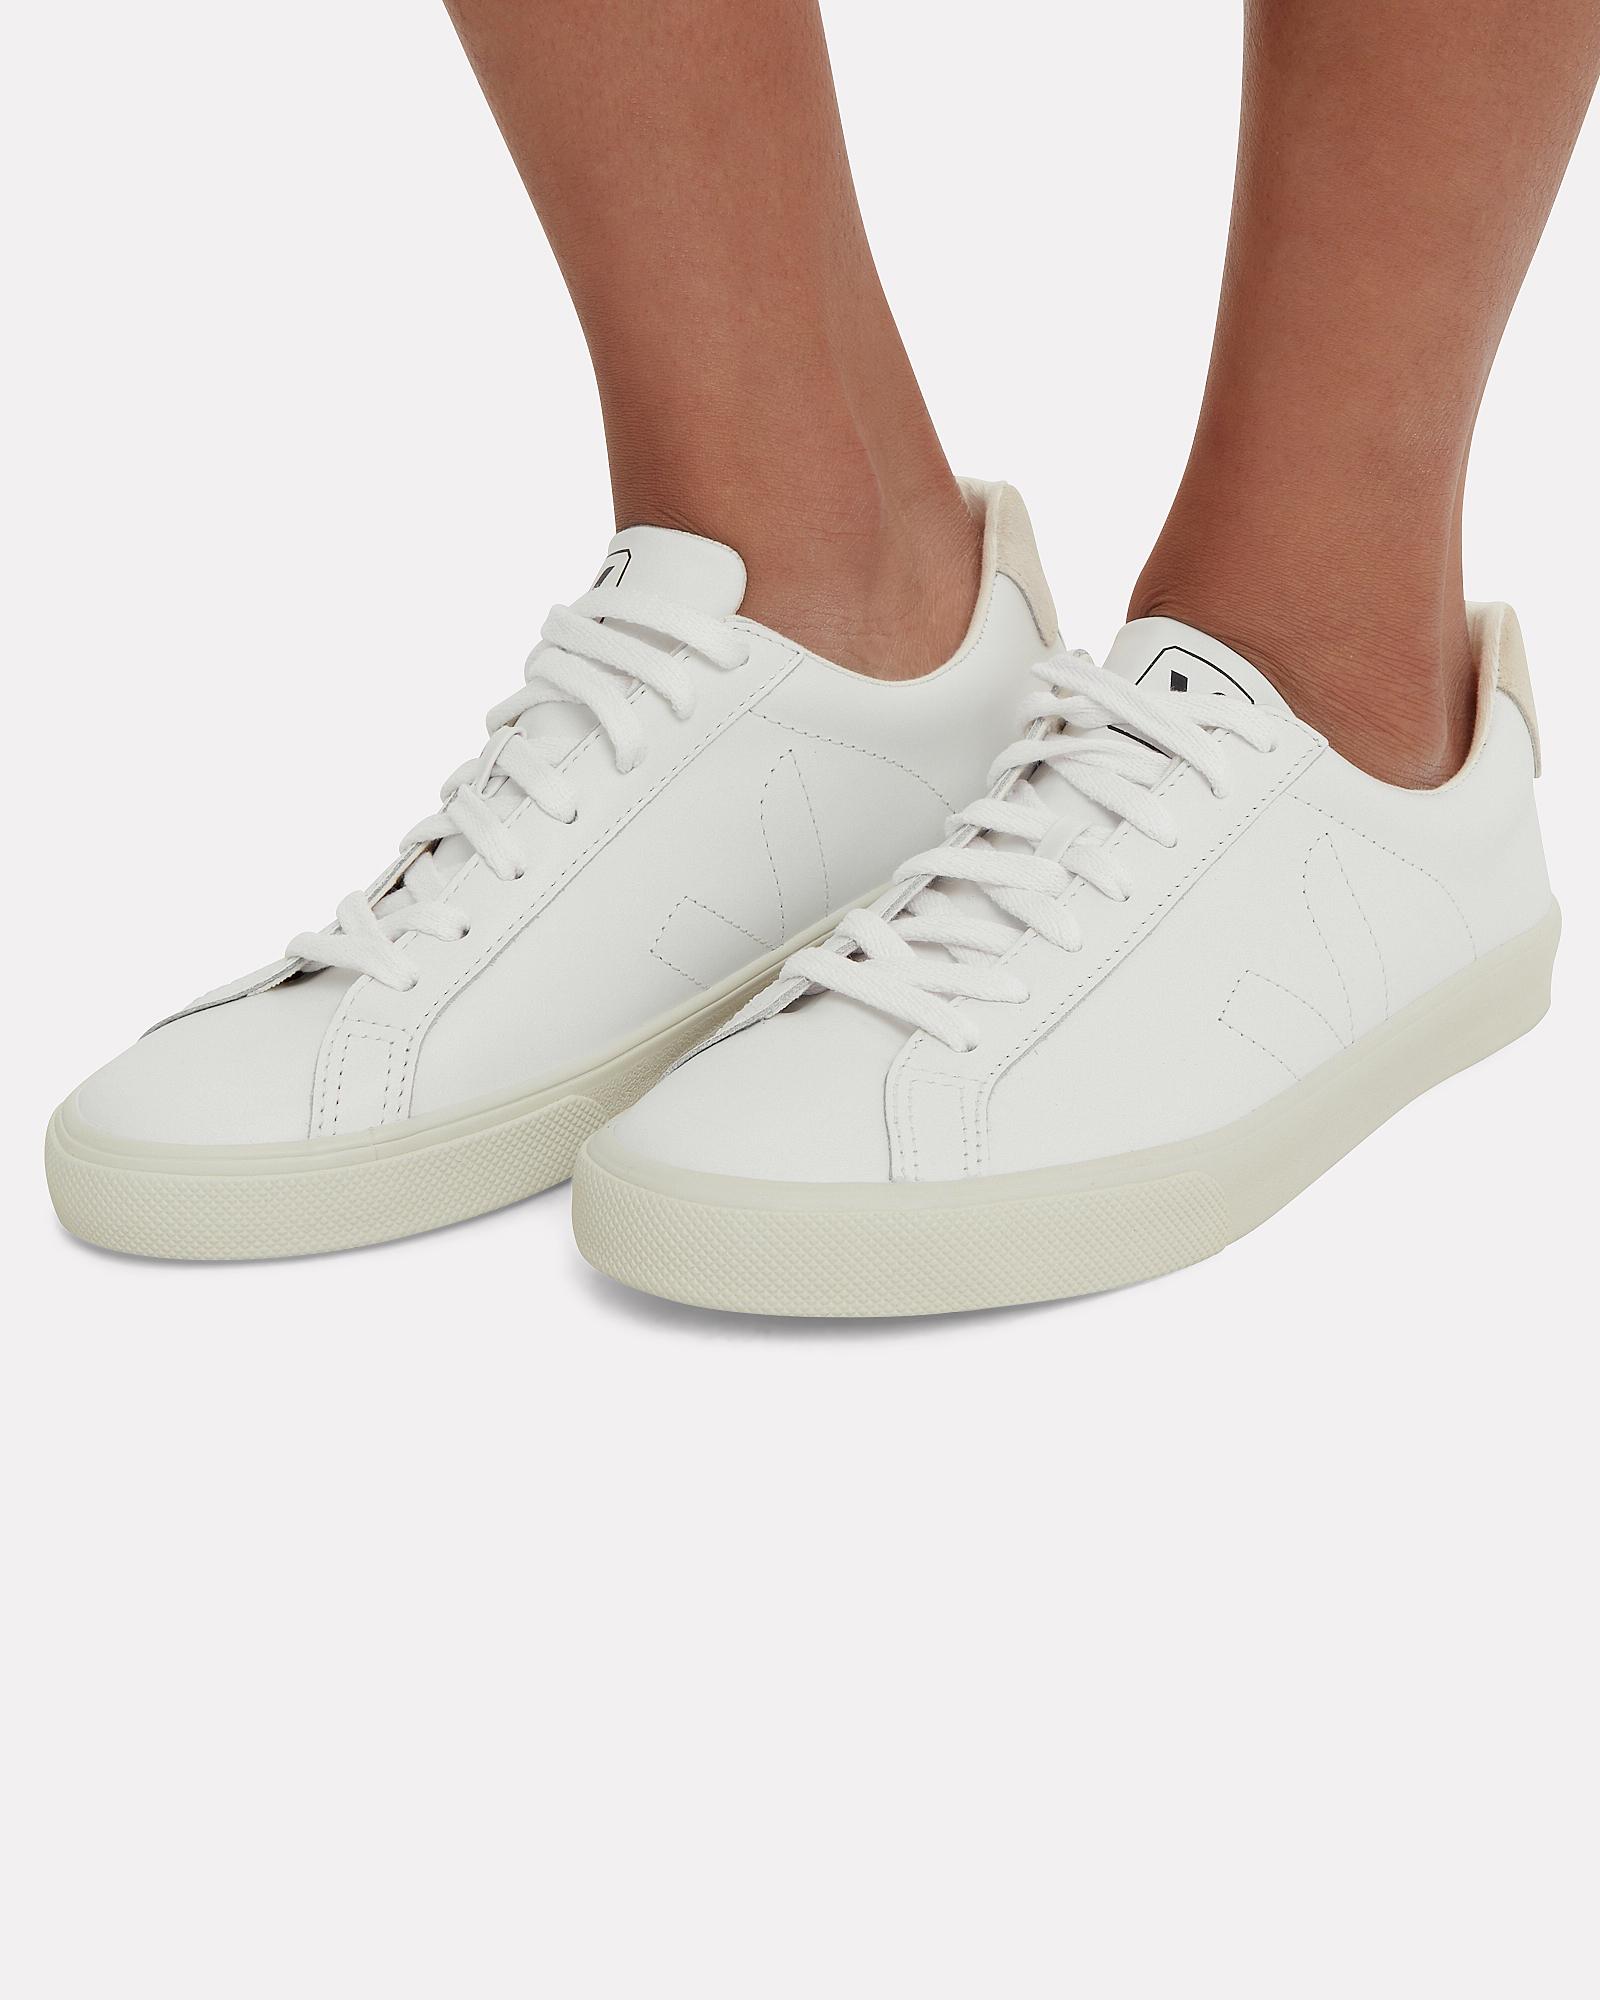 Veja Esplar Low-Top Sneakers | INTERMIX®